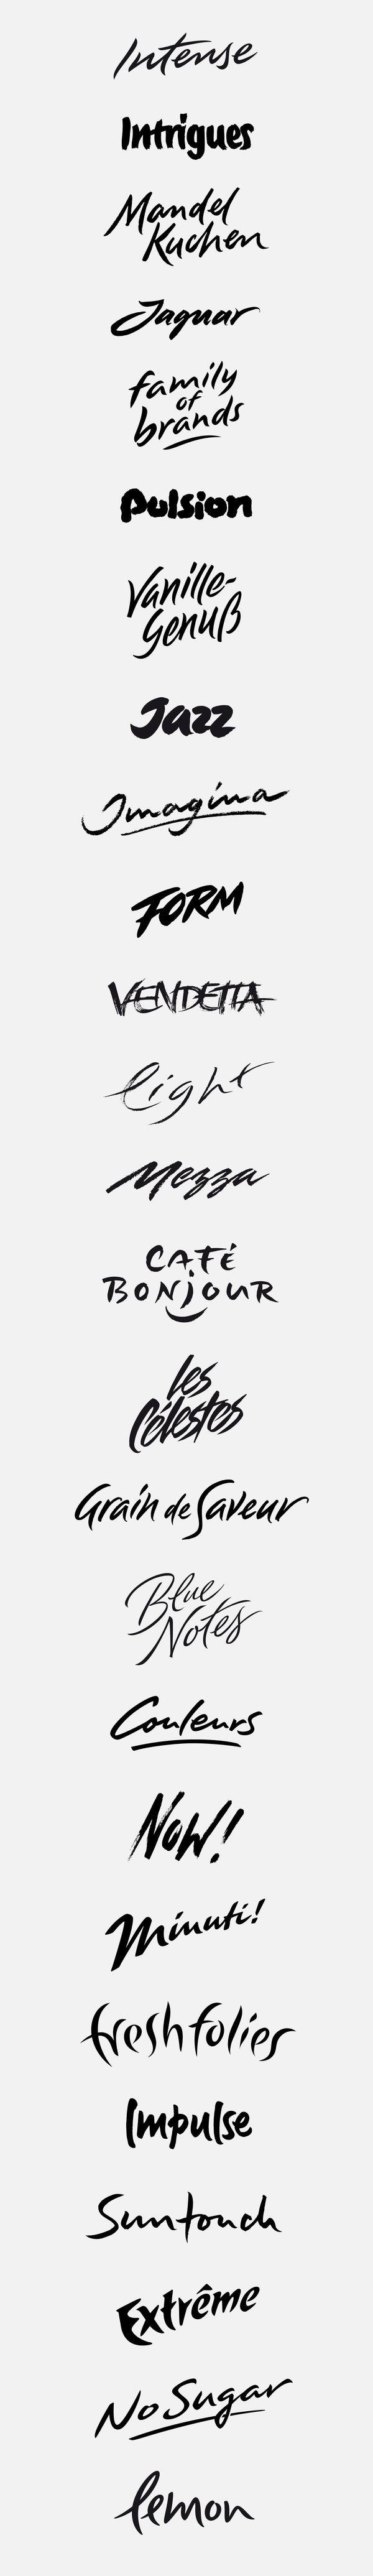 logotypes: expressiv, dynamic by Peter Becker, via Behance